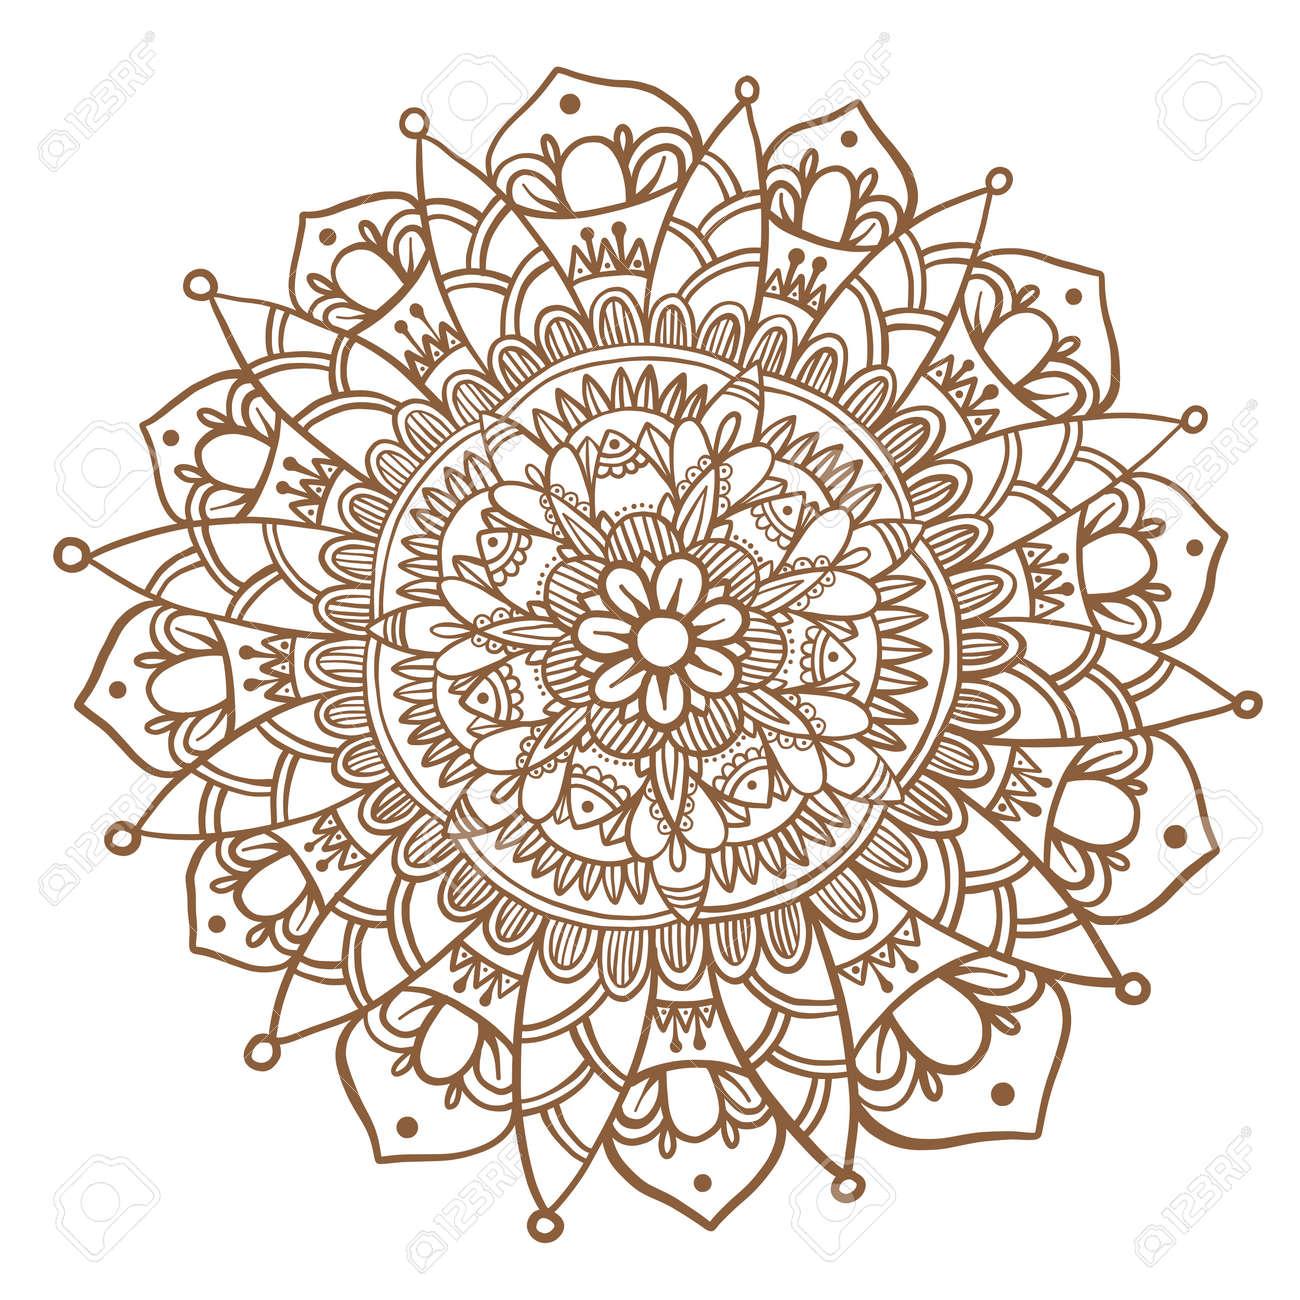 Hand Drawn Flower Mandala Decorative Round Ornament Henna Design